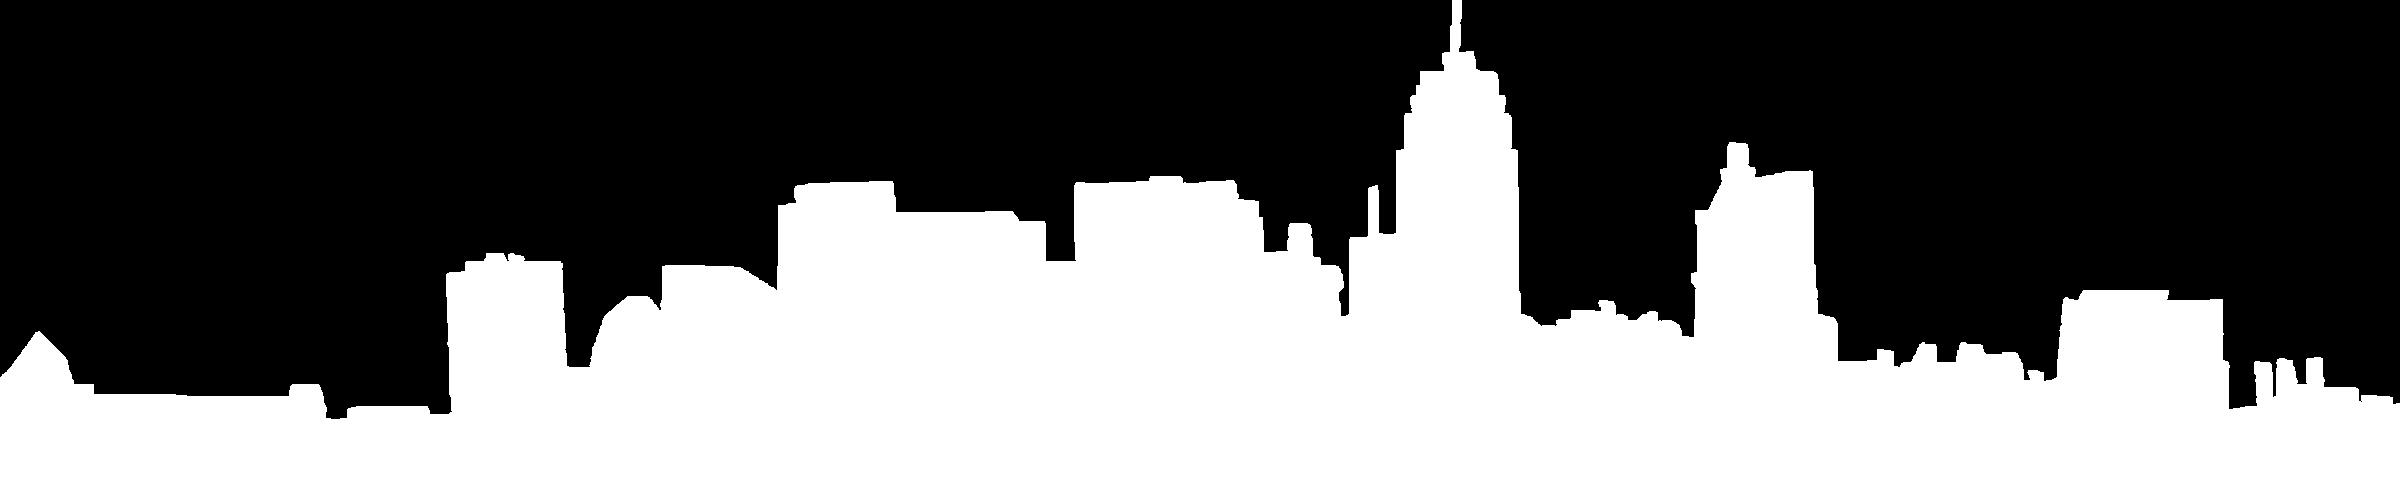 City Silhouette image